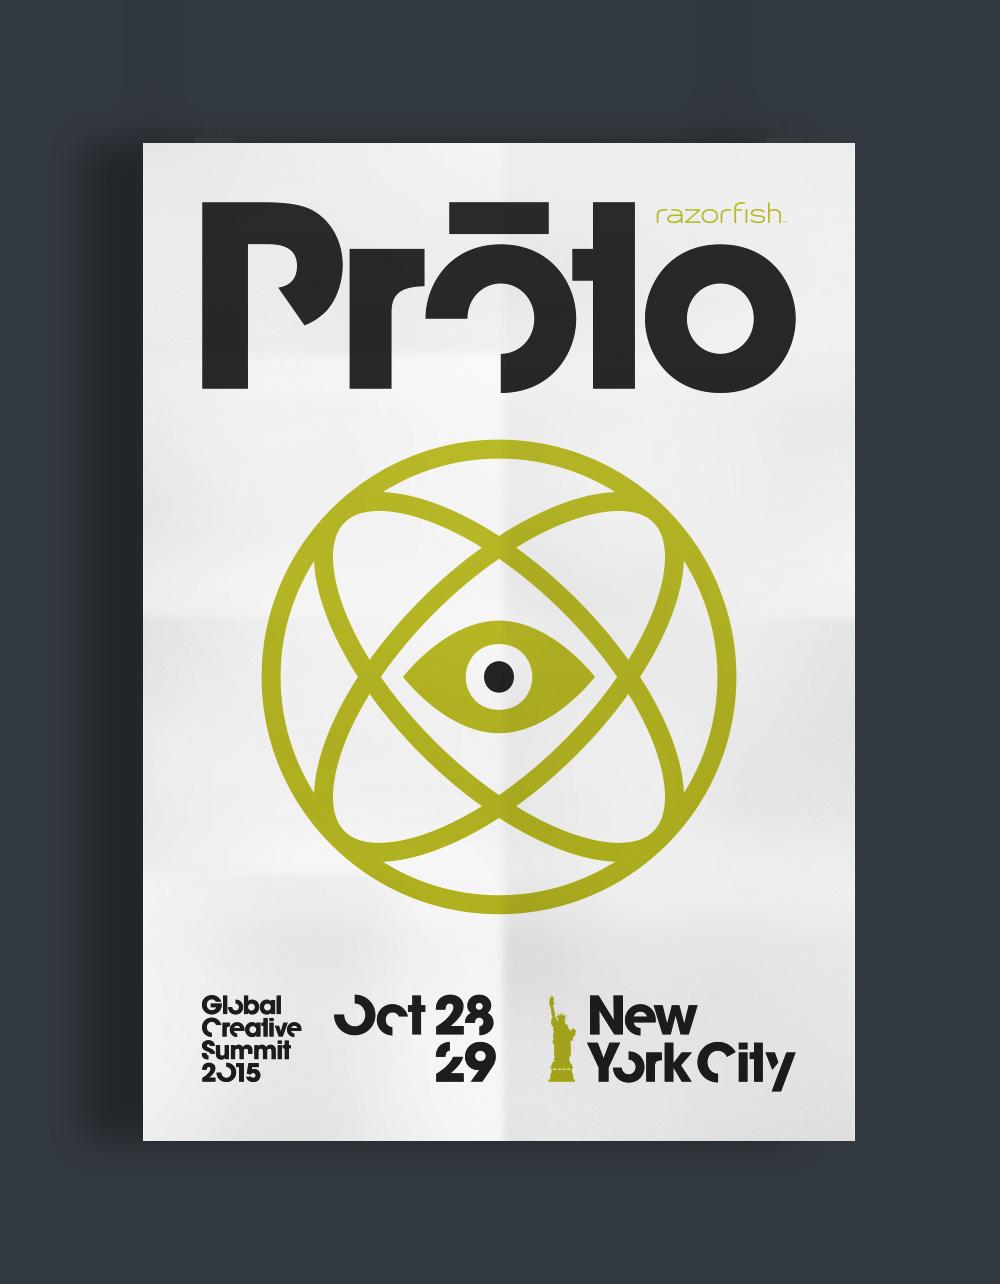 shane_bzdok_proto_poster